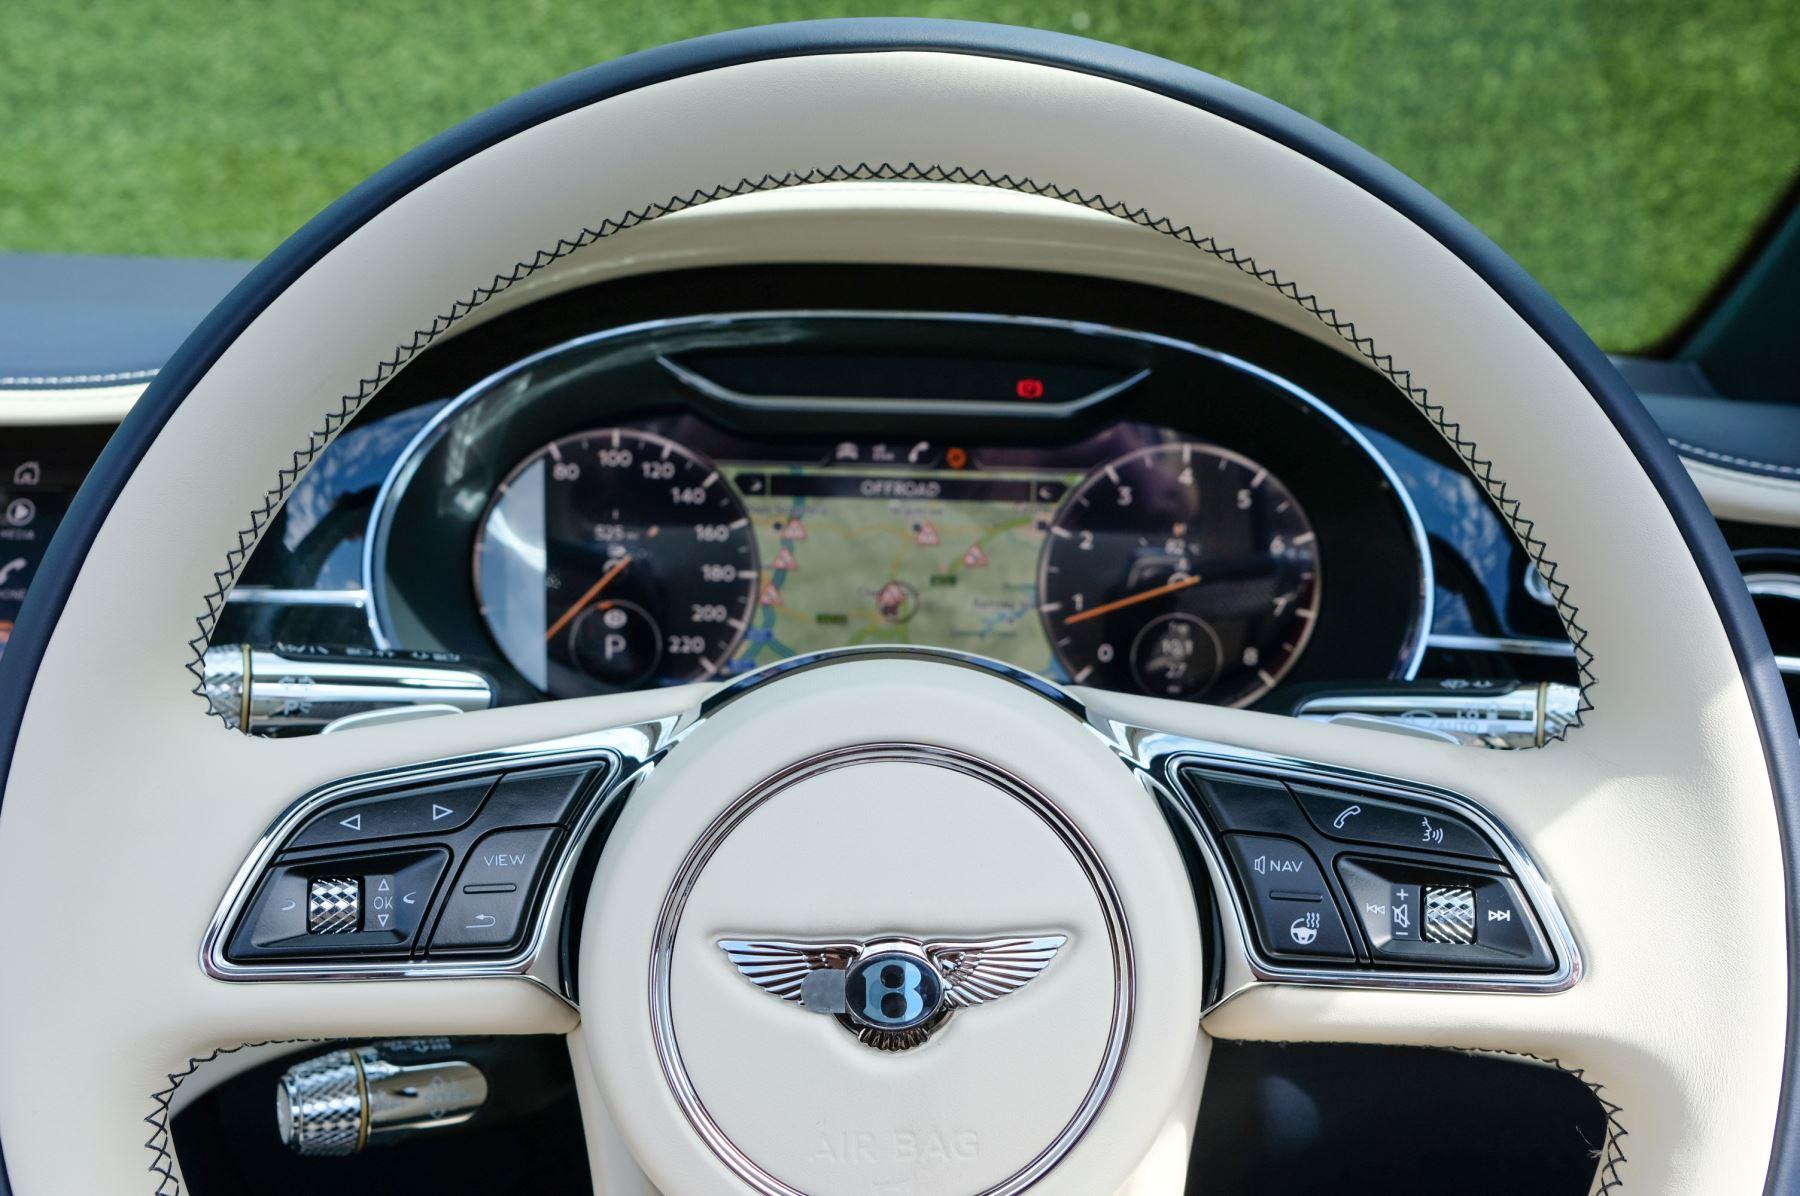 Bentley Continental GTC 4.0 V8 Mulliner Edition 2dr Auto [Tour Spec] image 14